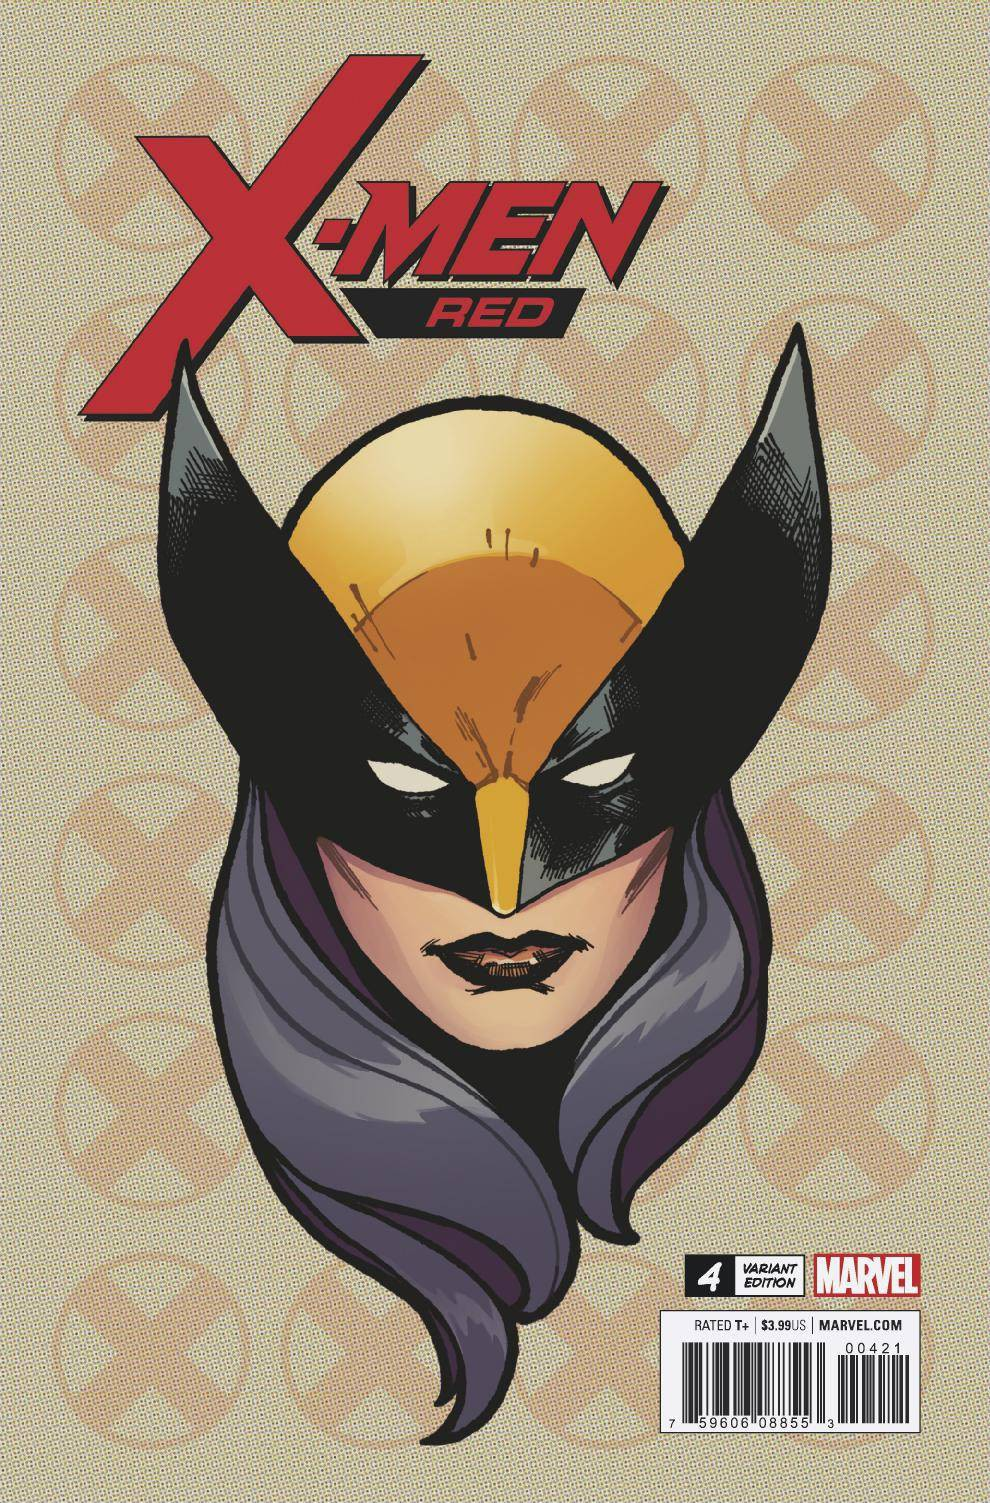 Marvel X-Men Red #4 [Charset Headshot Variant] by